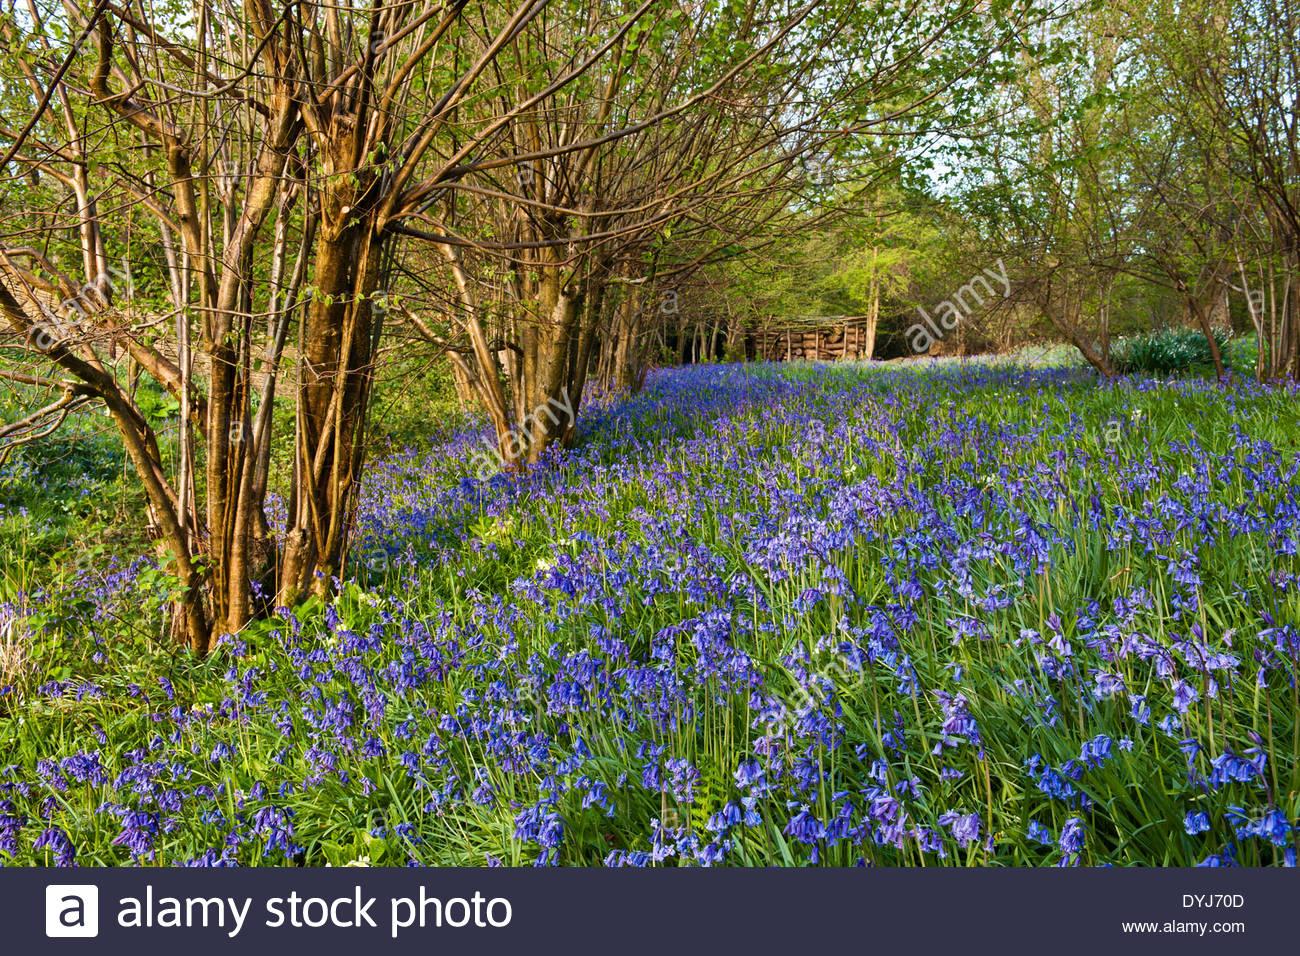 ... English Bluebells Hyacinthoides Non Scriptus Wildflower Garden View  Hazel Coppice Corylus Avellena Native Wild Woodland